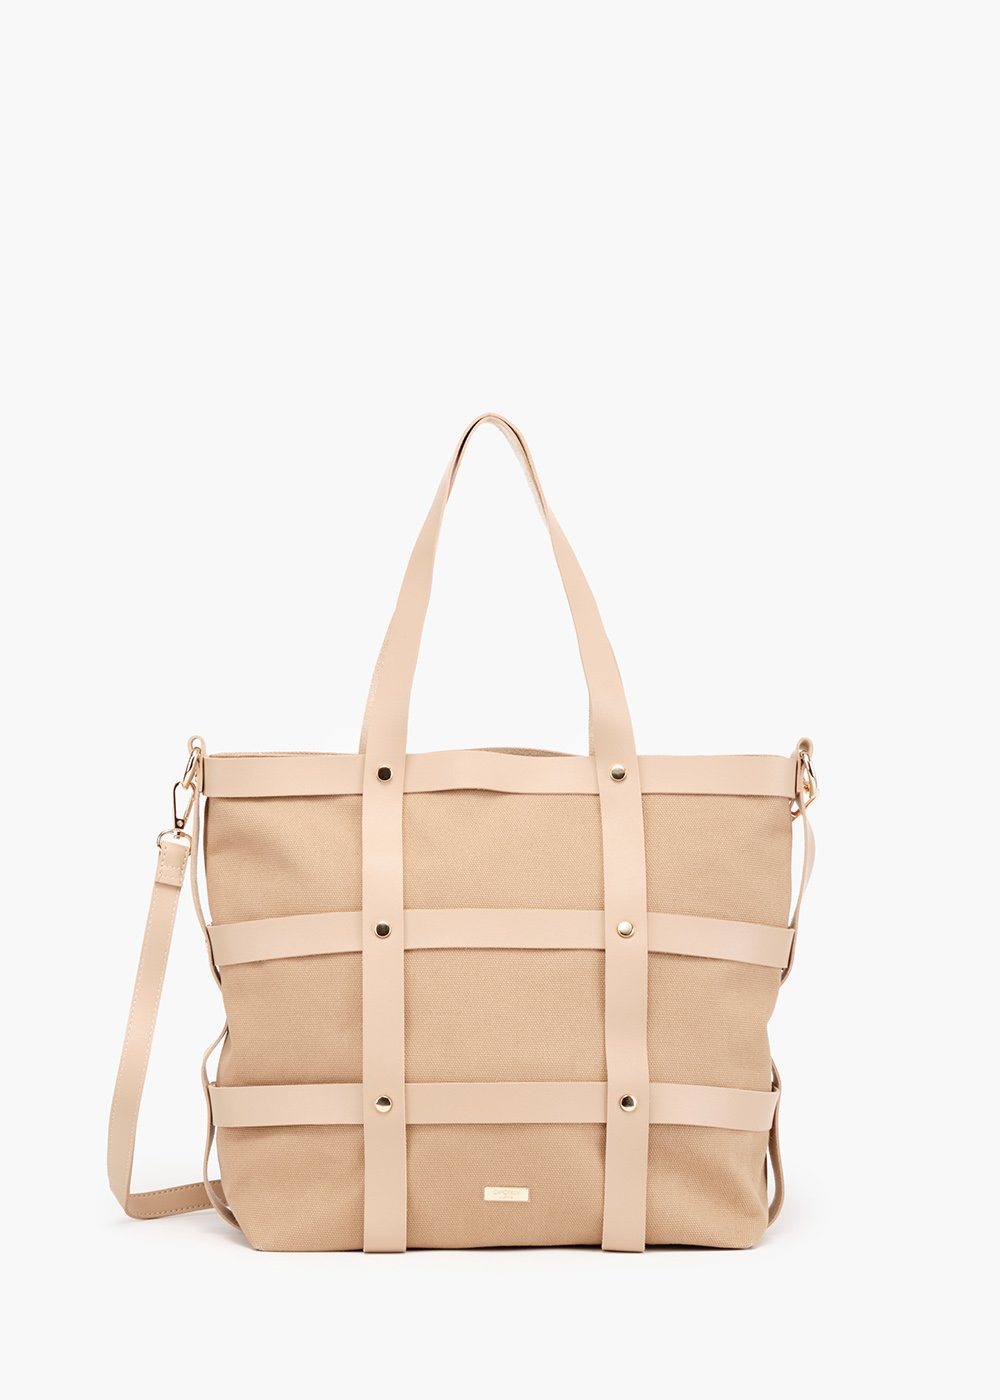 Bjor Shopping bag cage model with micro studs detail - Safari - Woman